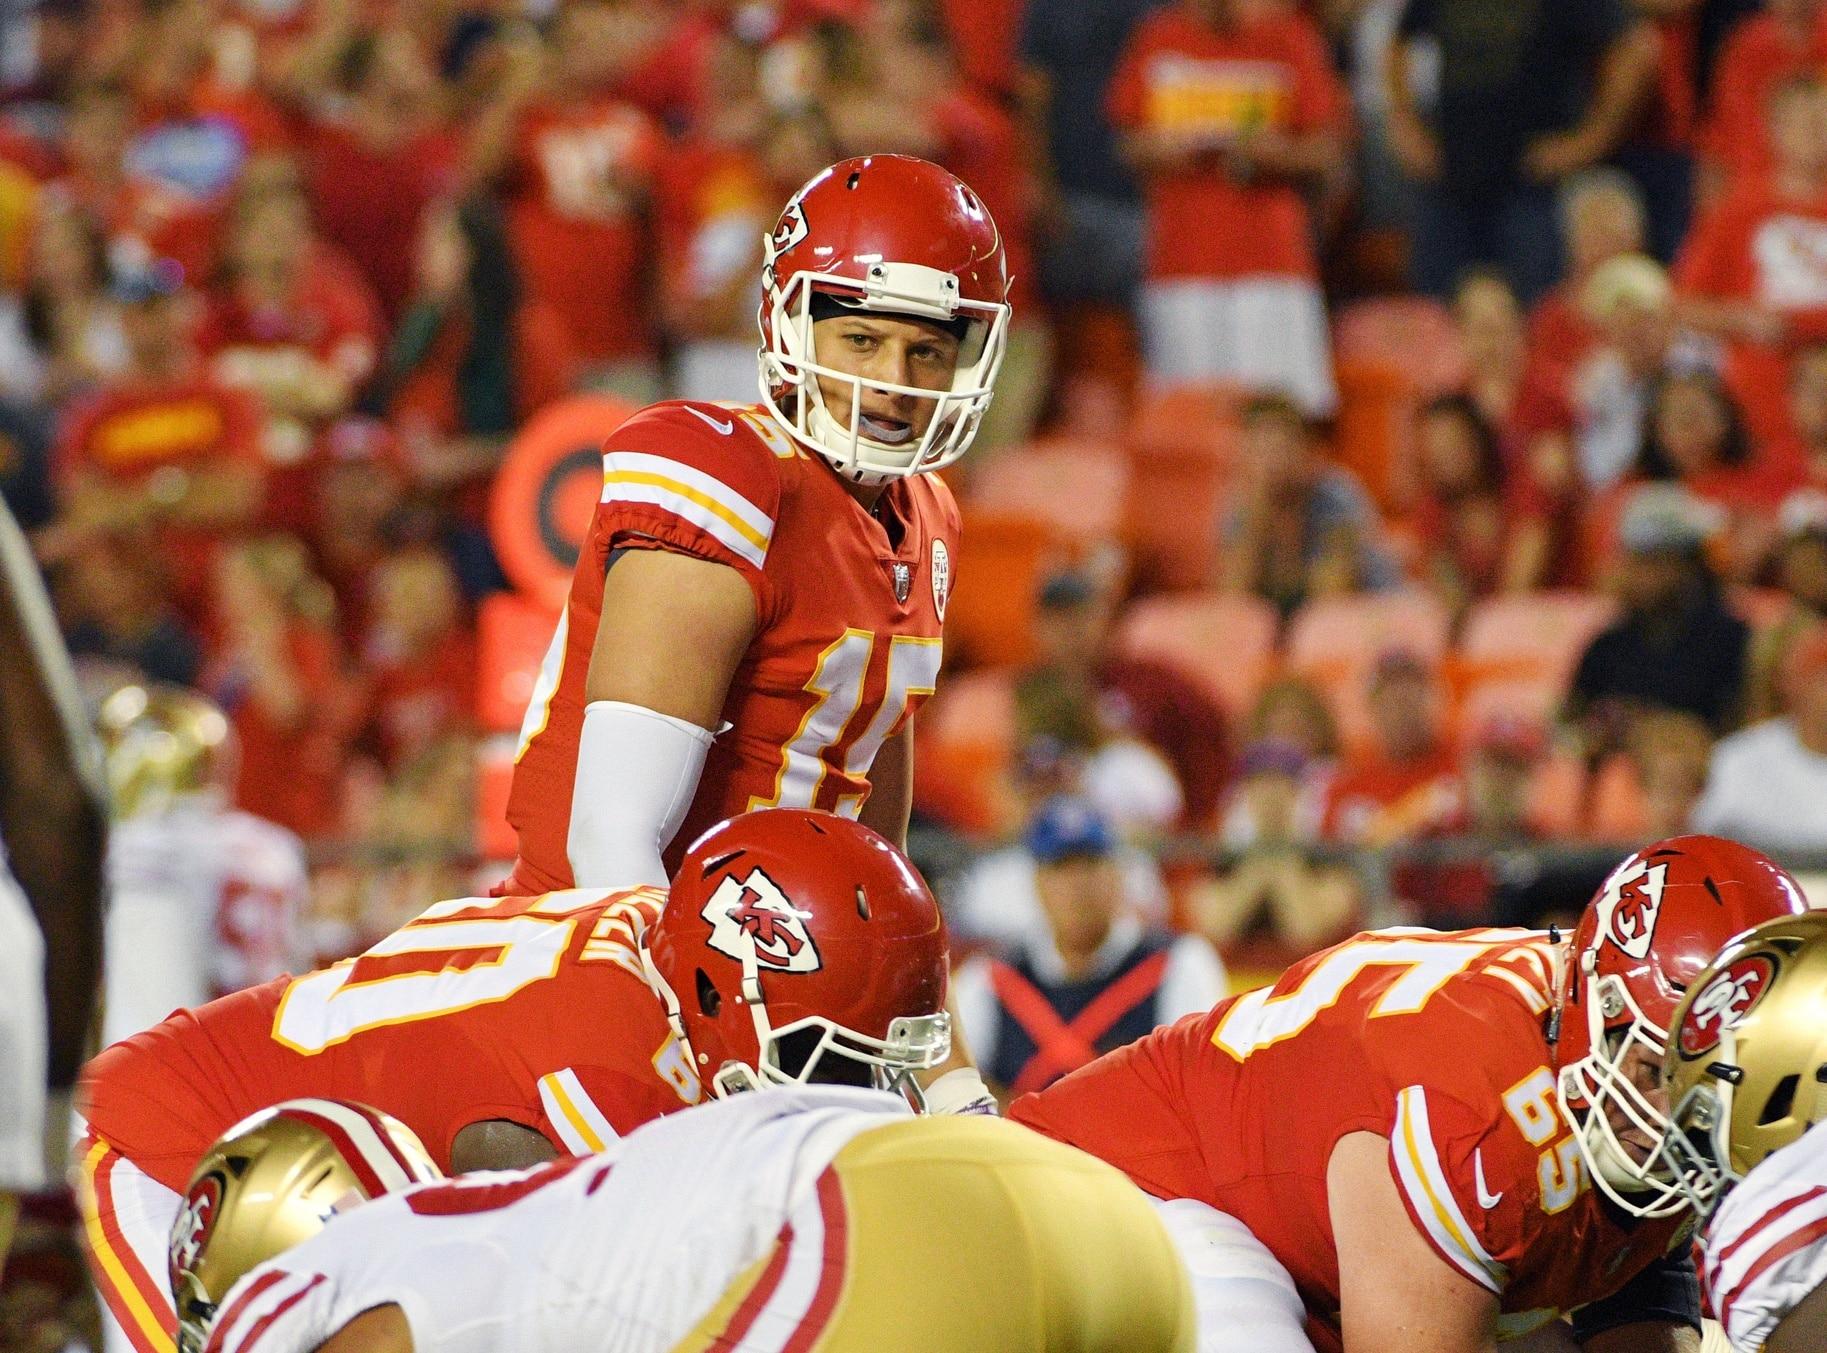 NFL star in the making, Kansas City Chiefs quarterback Patrick Mahomes